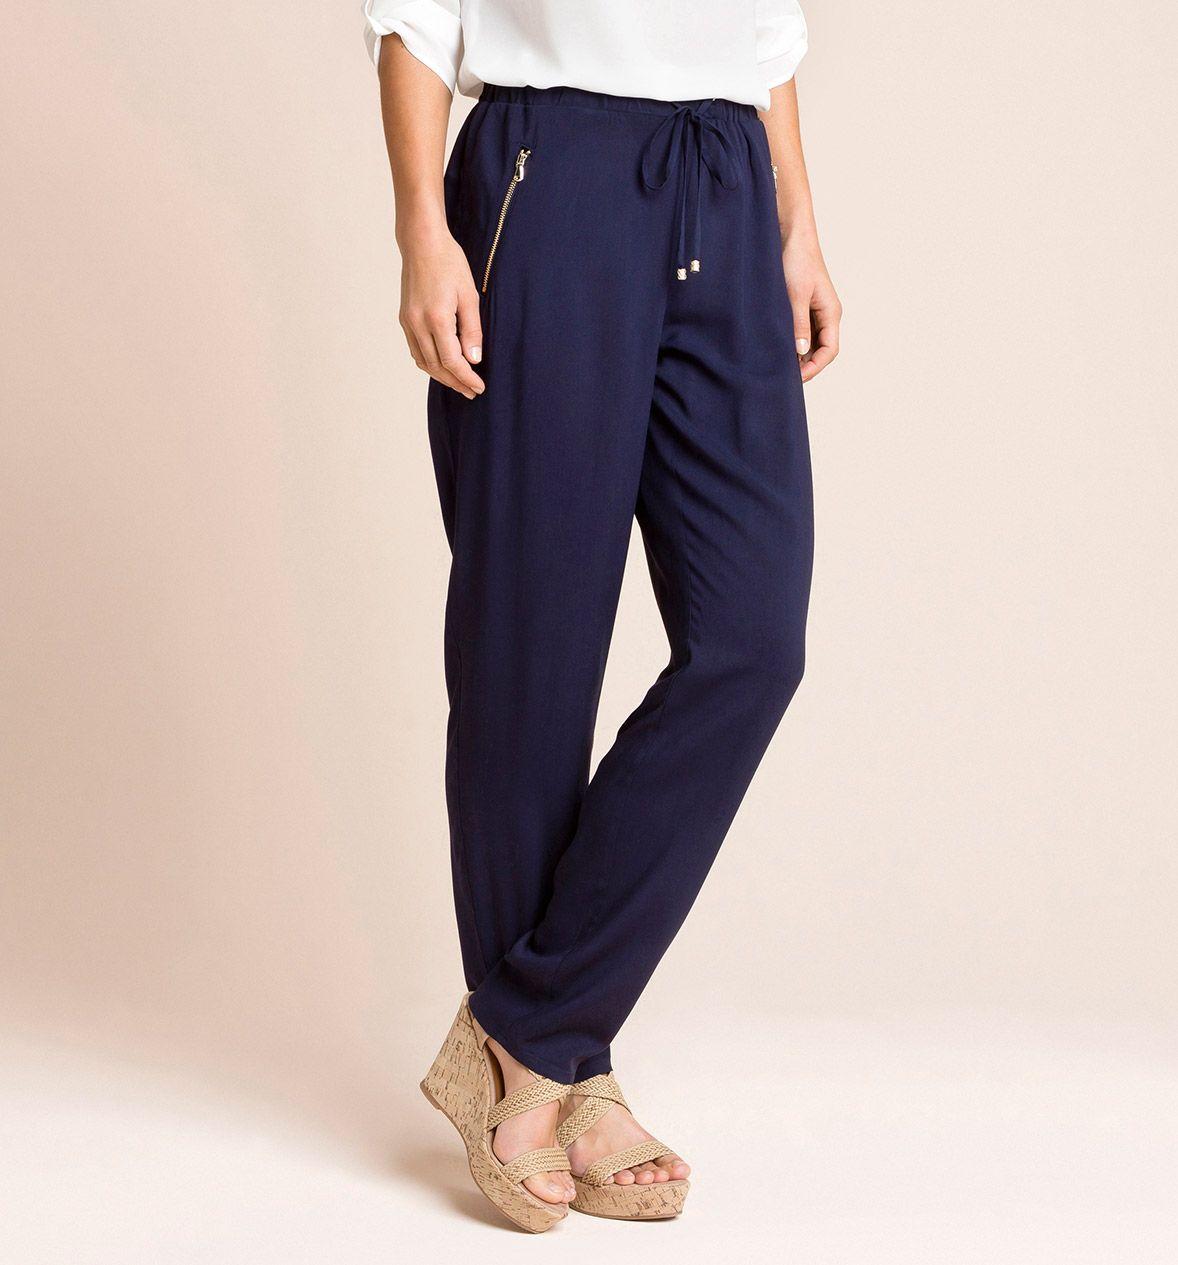 Pantalones fluidos azul marino